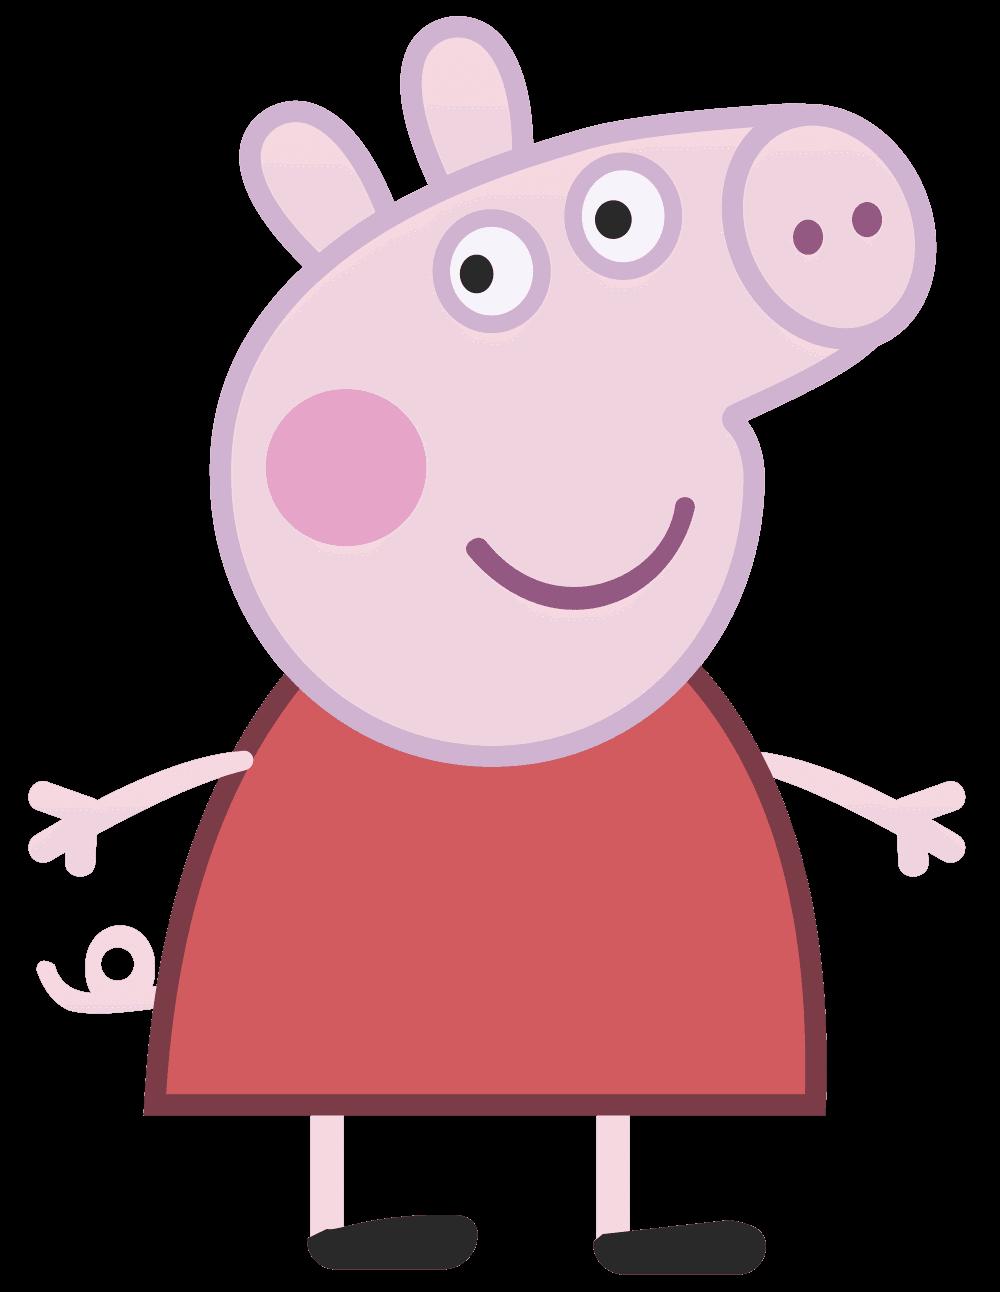 Peppa The Pig Head Clipart - Hog Head, Transparent background PNG HD thumbnail